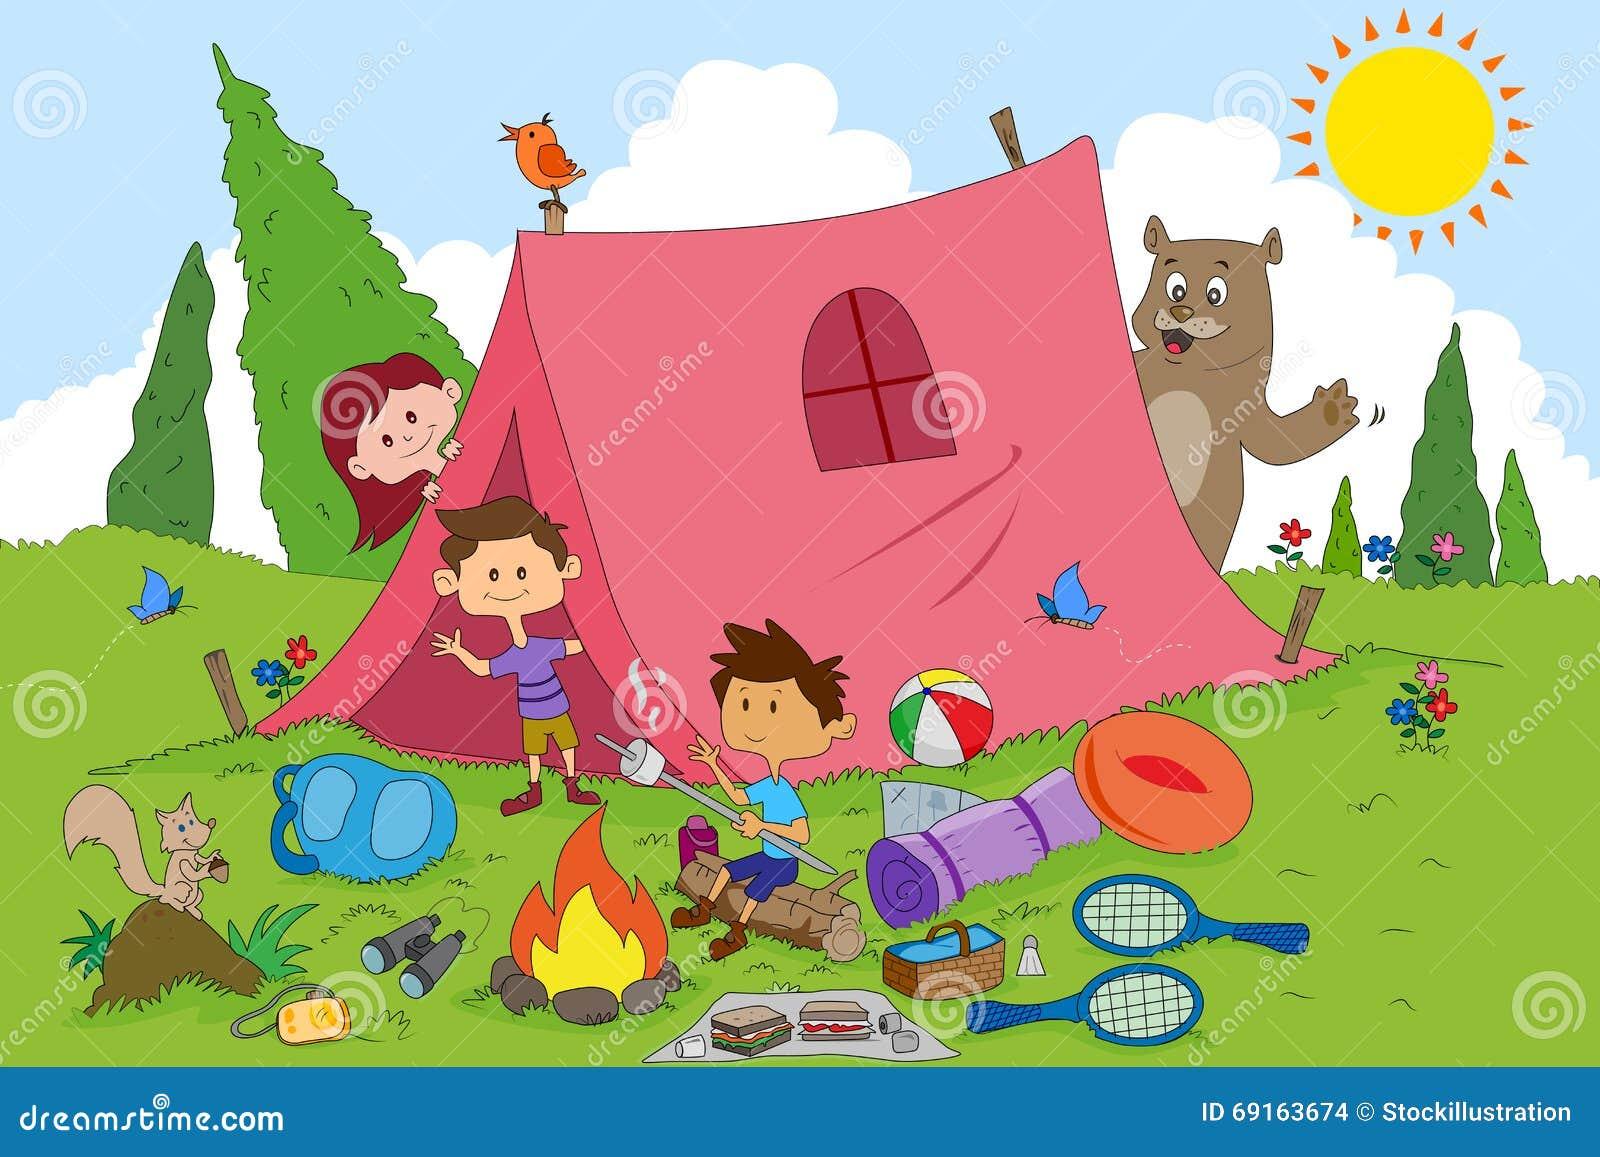 Children Enjoying Summer Camp Activities